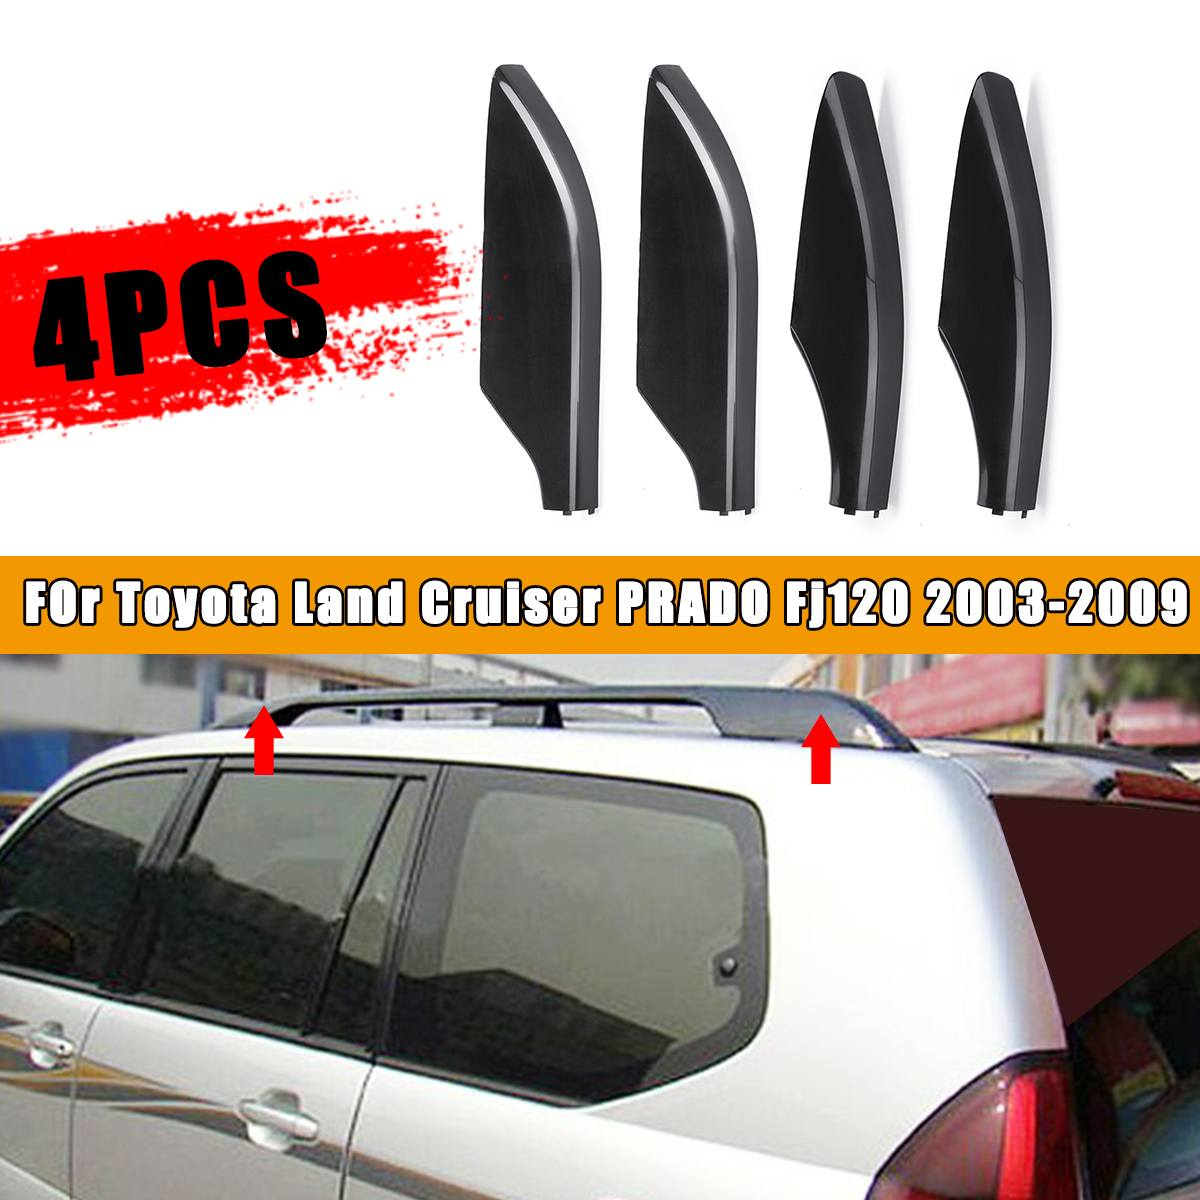 For Toyota Prado FJ120 2003-2009 Car Top Mounted Roof Rack Rails Bar Tail cover